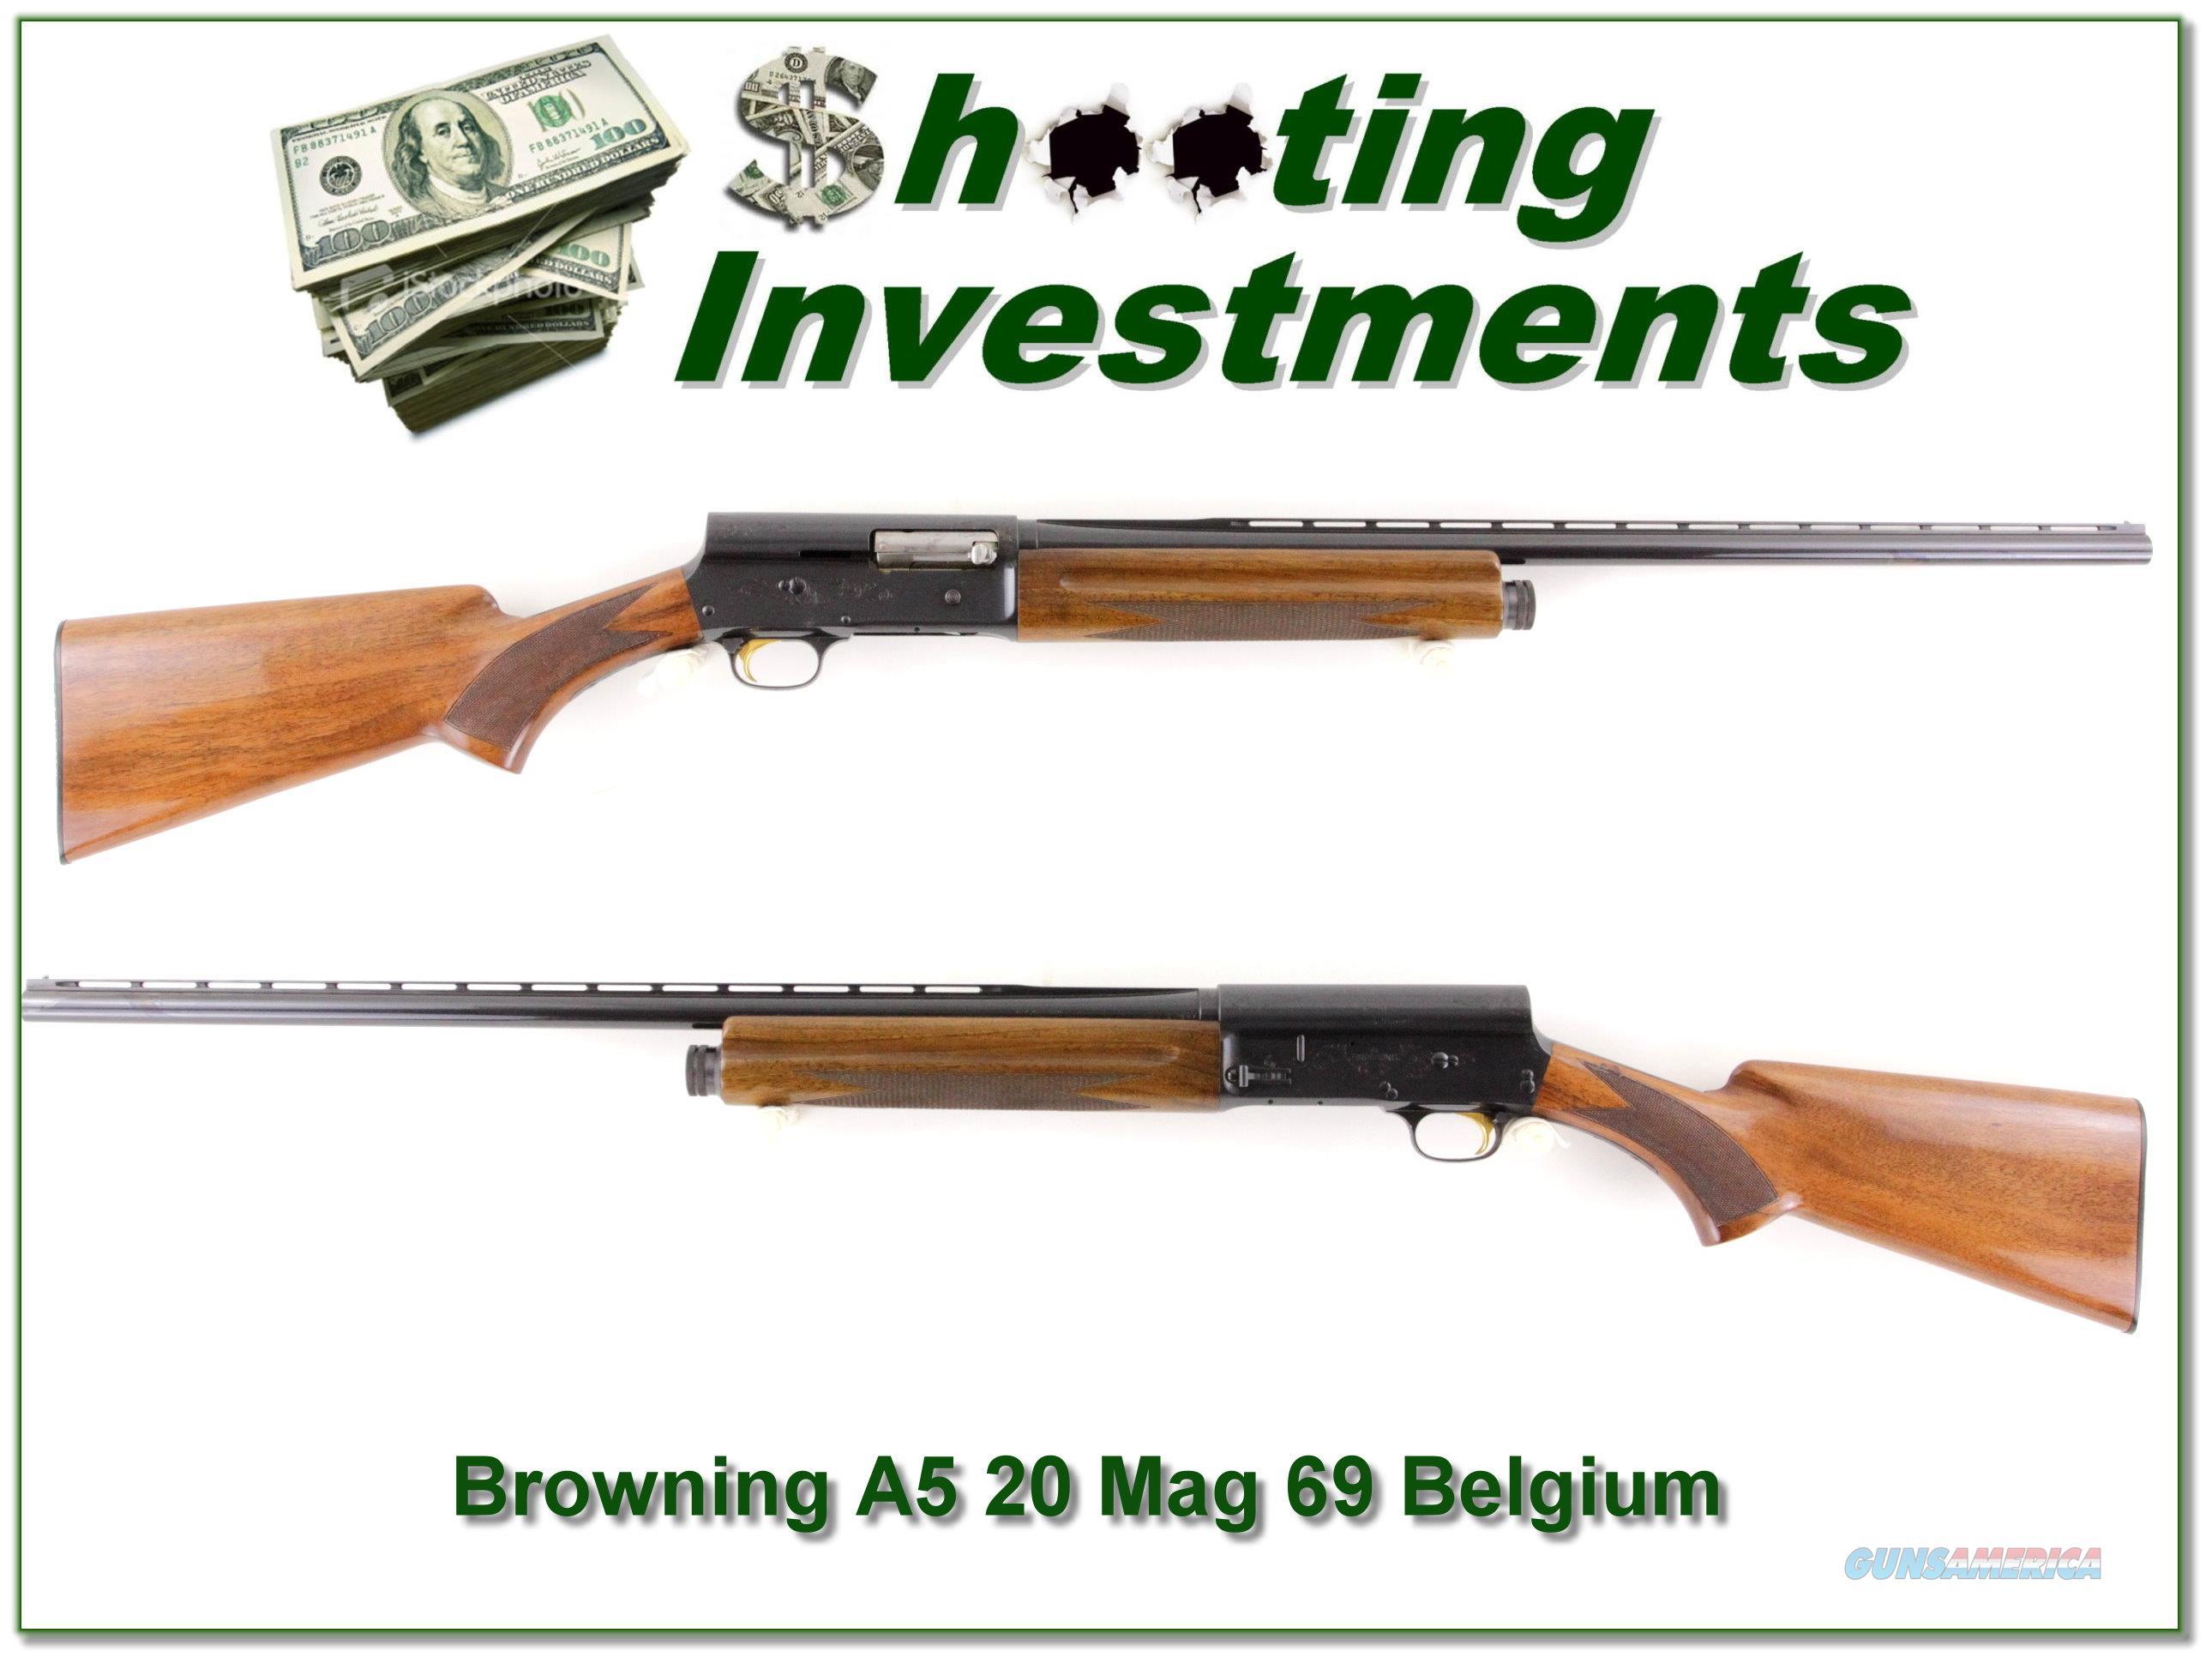 Browning A5 20 Magnum 69 Belgium Vent Rib Mod  Guns > Shotguns > Browning Shotguns > Autoloaders > Hunting